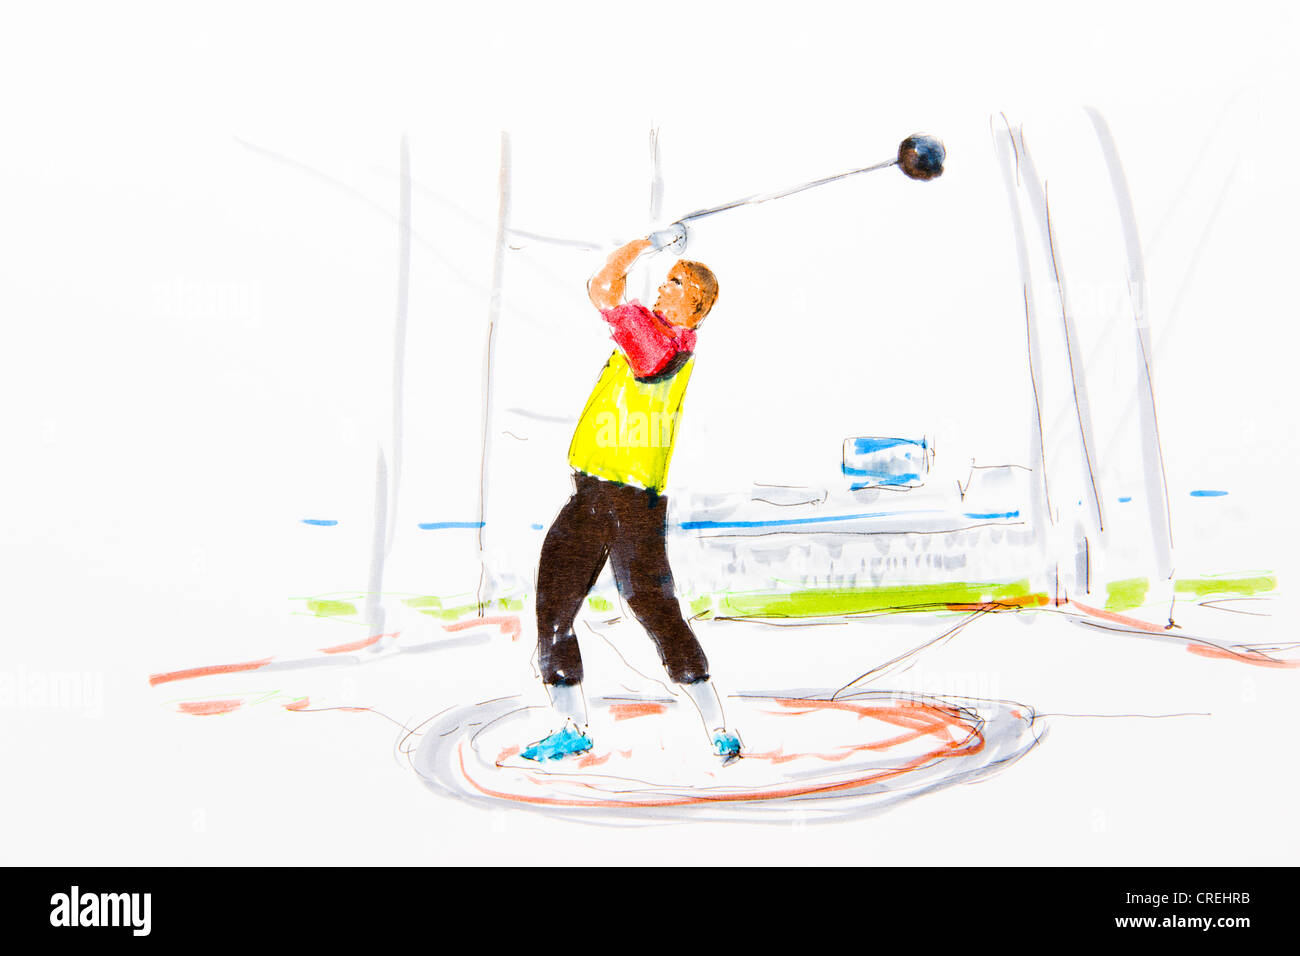 Hammer thrower, coloured drawing, by artist Gerhard Kraus, Kriftel, Germany - Stock Image